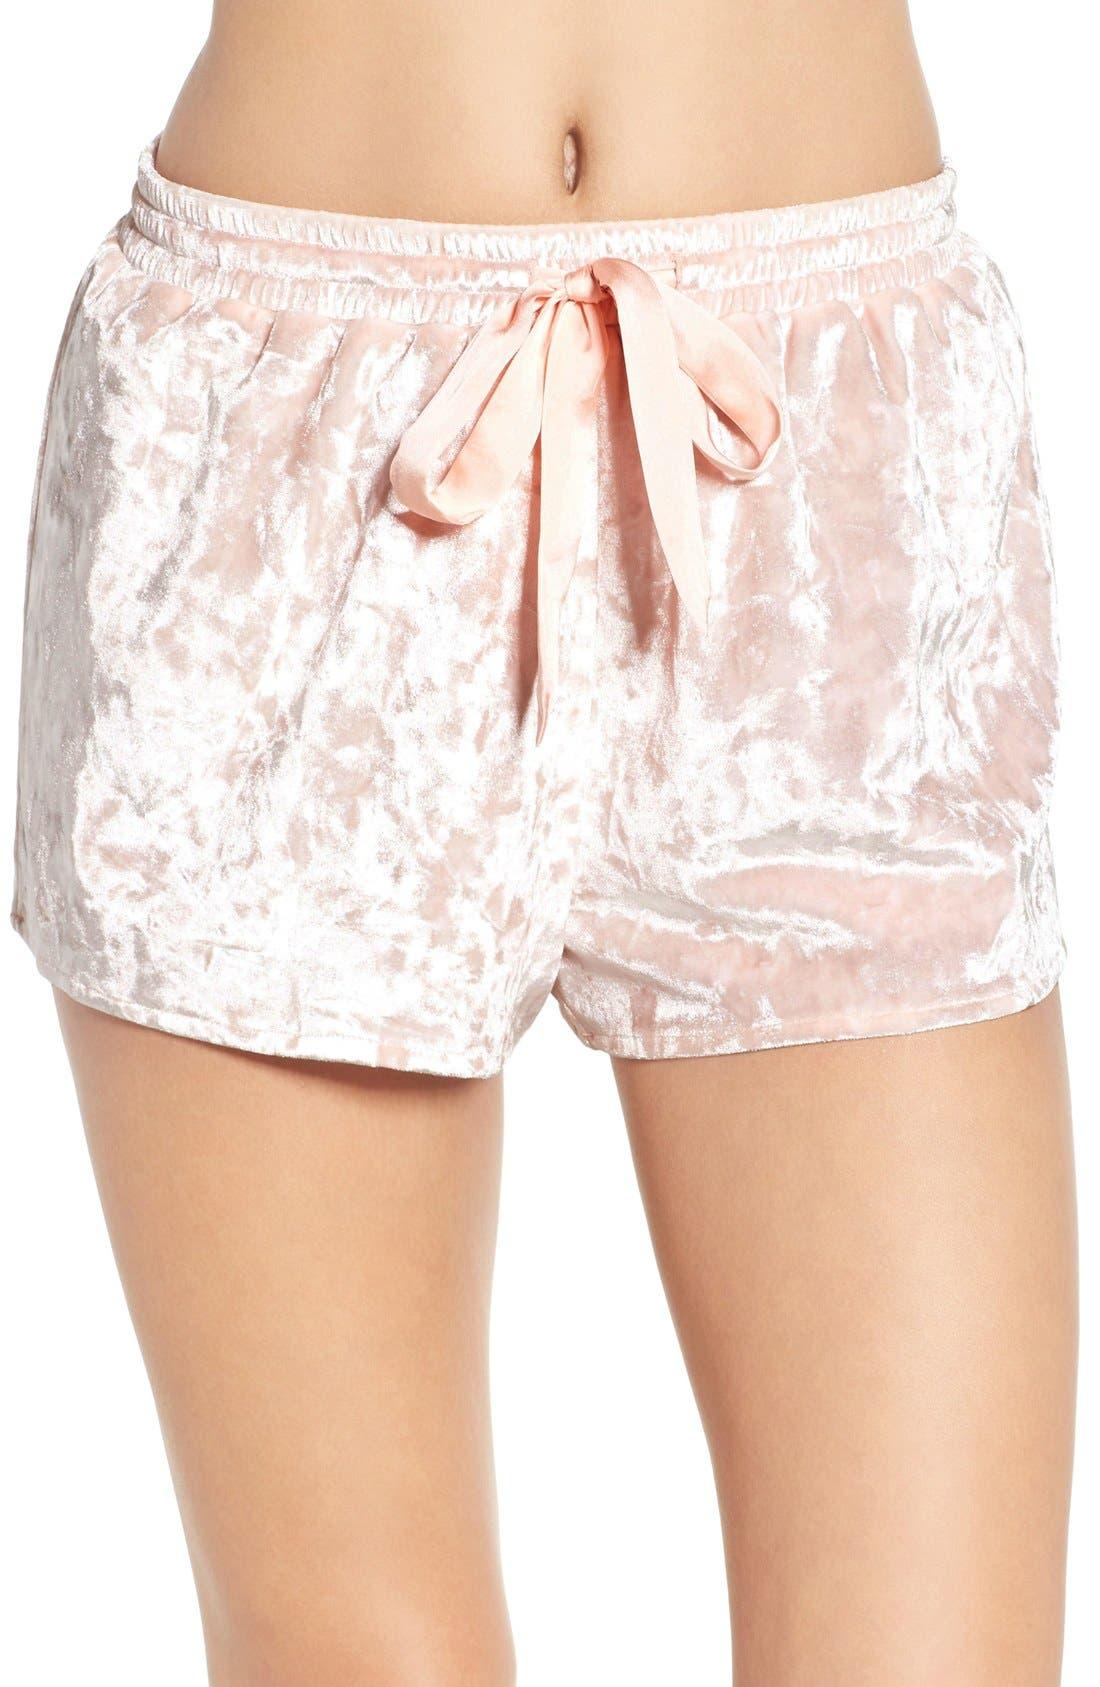 Crushed Velvet Shorts,                             Main thumbnail 1, color,                             Pink Wood